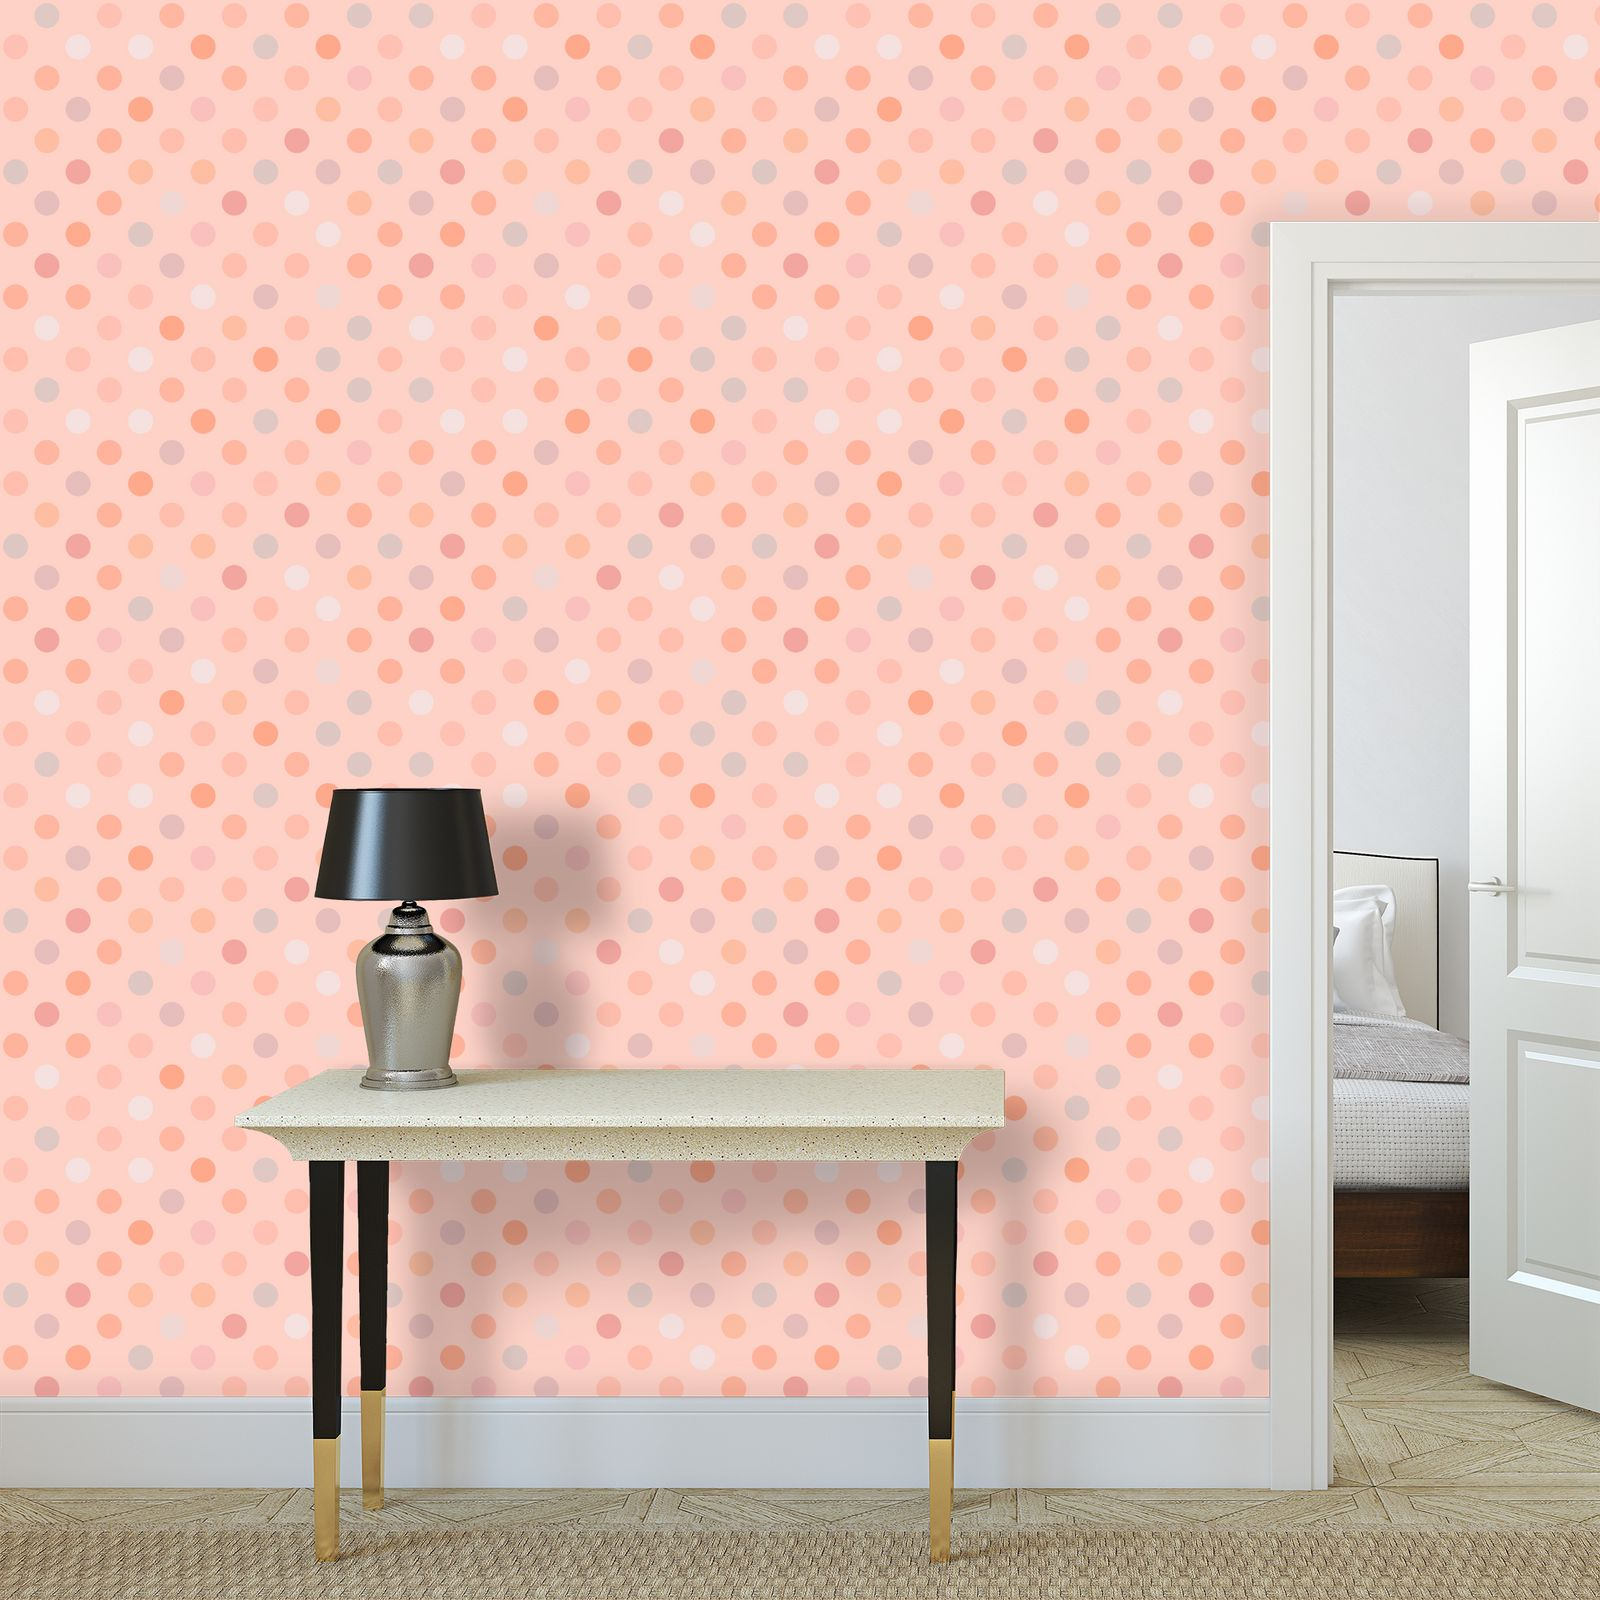 Silky dots - Wallpaper Rolls - Peach polka dot, powdery pink, feminine vintage, girly, baby, kids lovely gift - design by Tiana Lofd